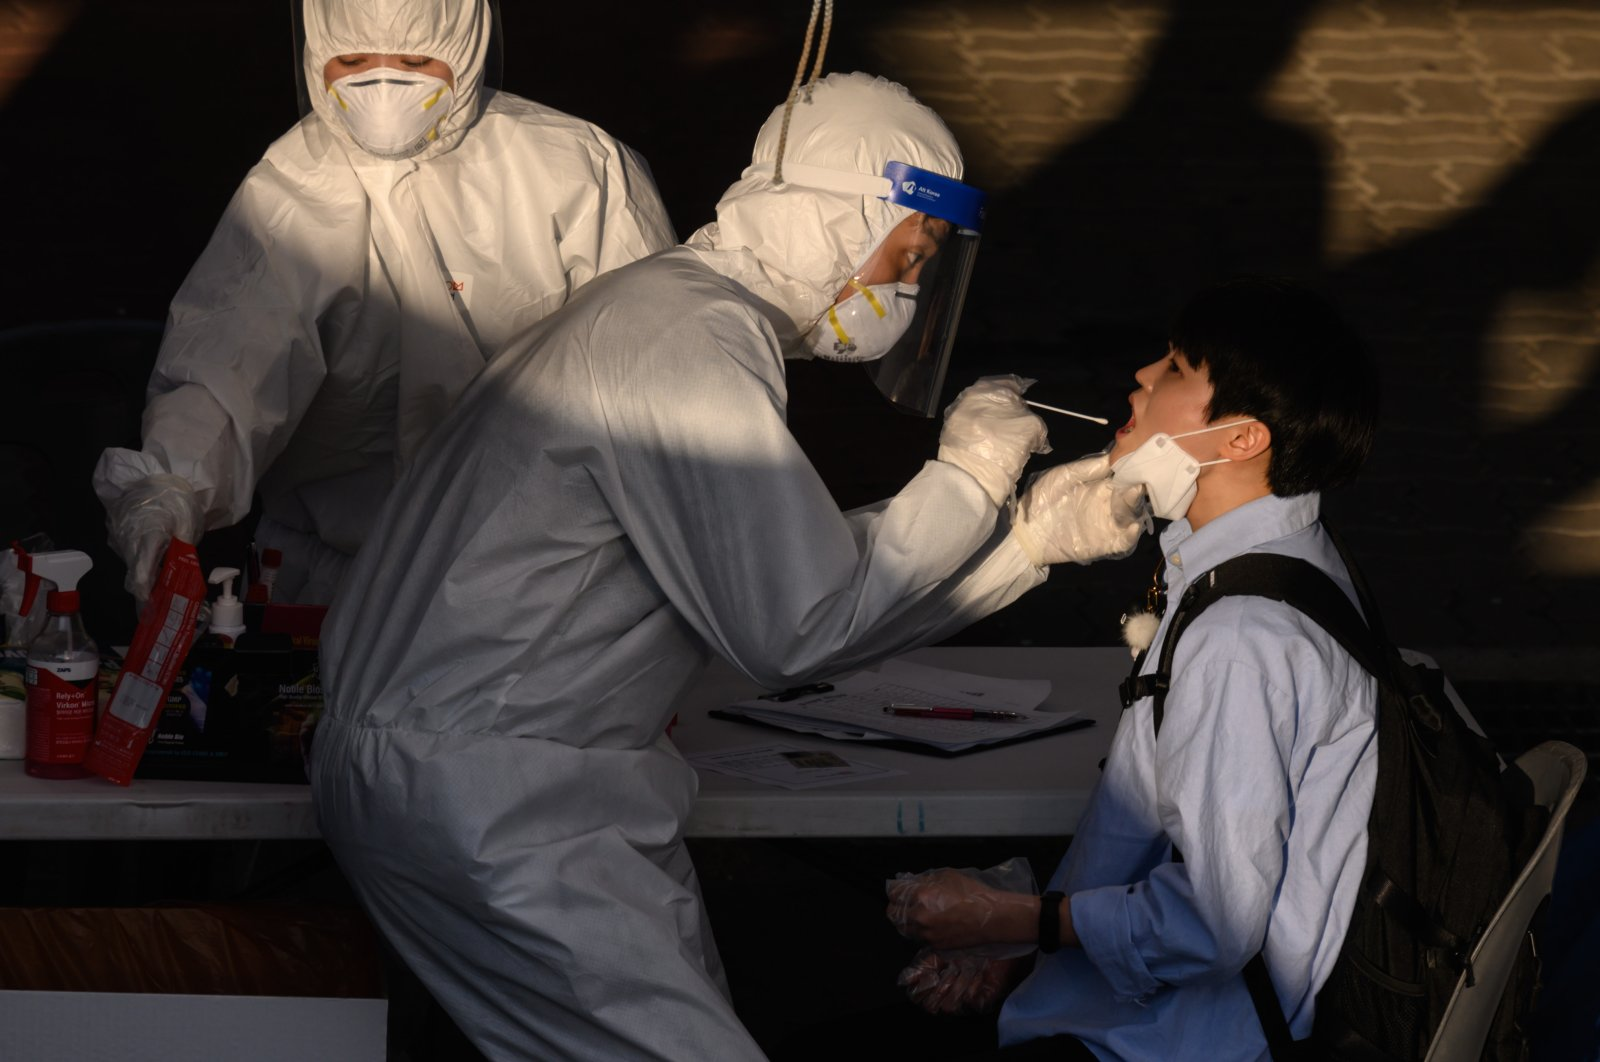 A health worker administers a swab at a temporary coronavirus testing center, Bucheon, South Korea, May 27, 2020. (AFP Photo)